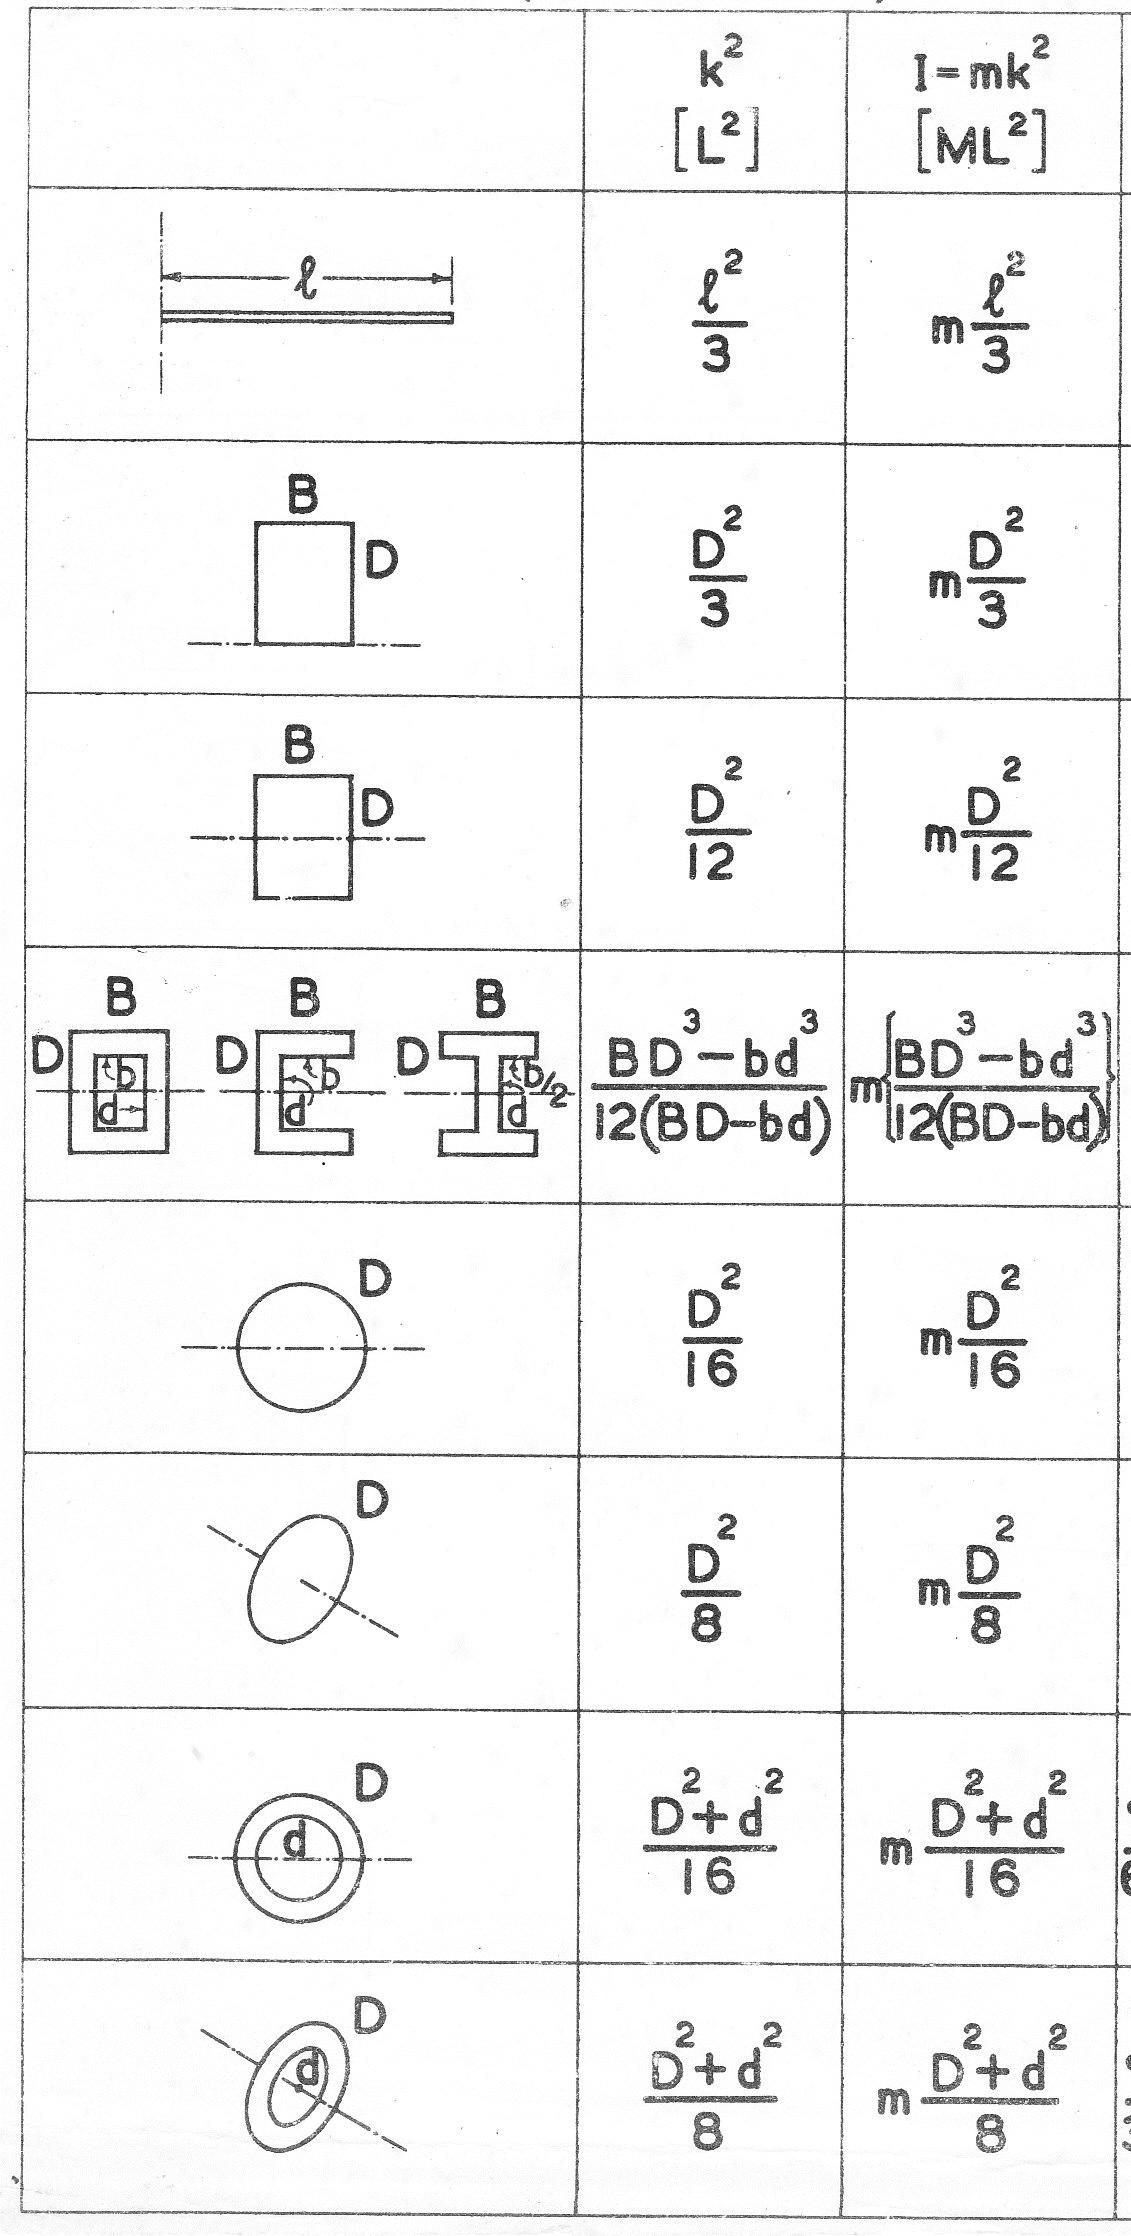 Moment of inertia table pdf